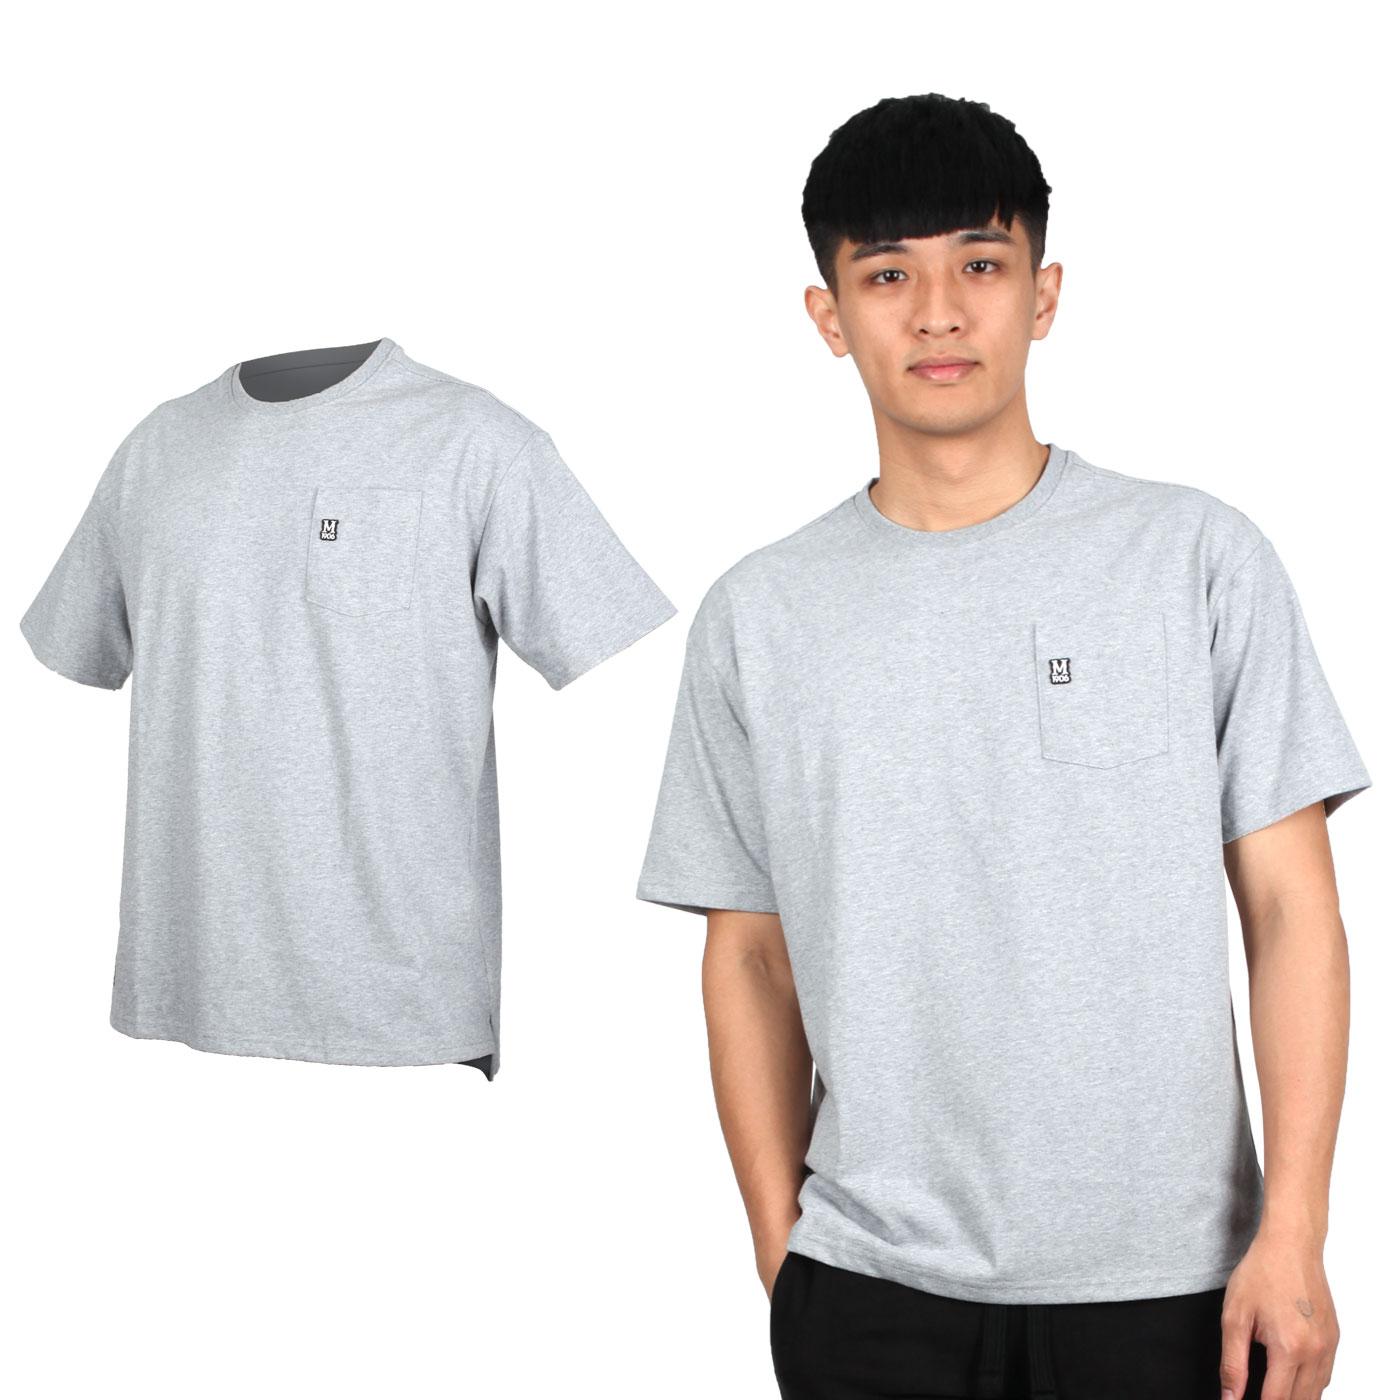 MIZUNO 男款1906系列短袖T恤 D2TA000101 - 灰黑白